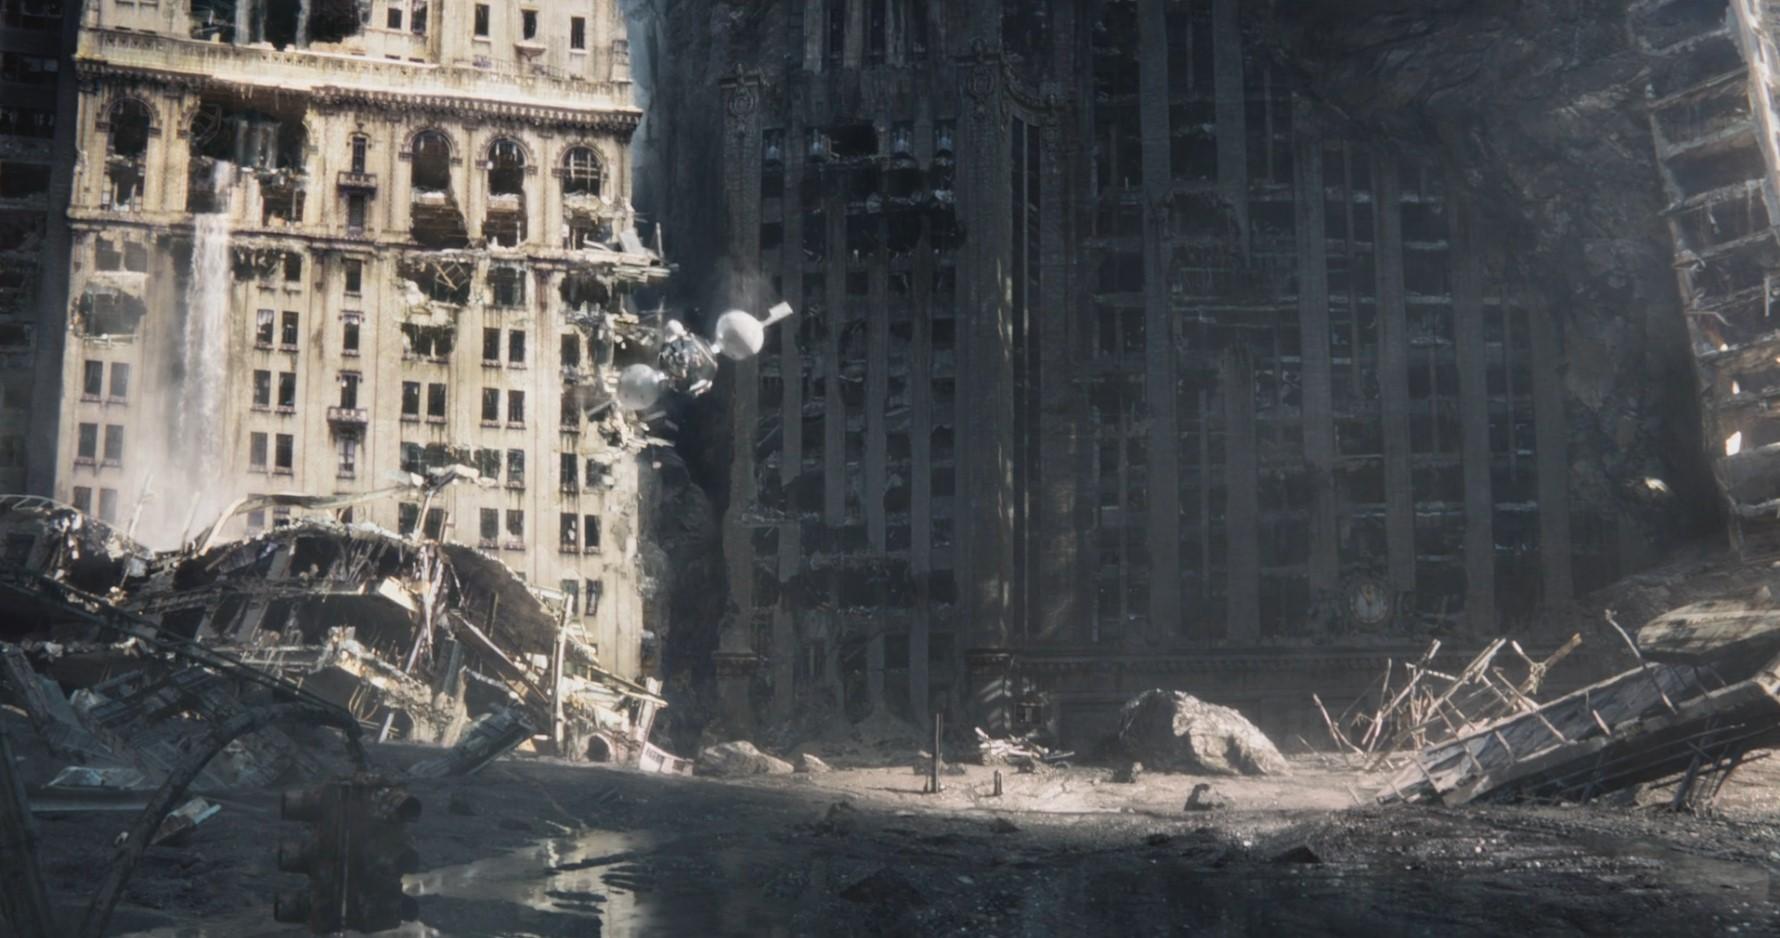 oblivion-matte-painting-felix-haas-aeb-402-video-screen